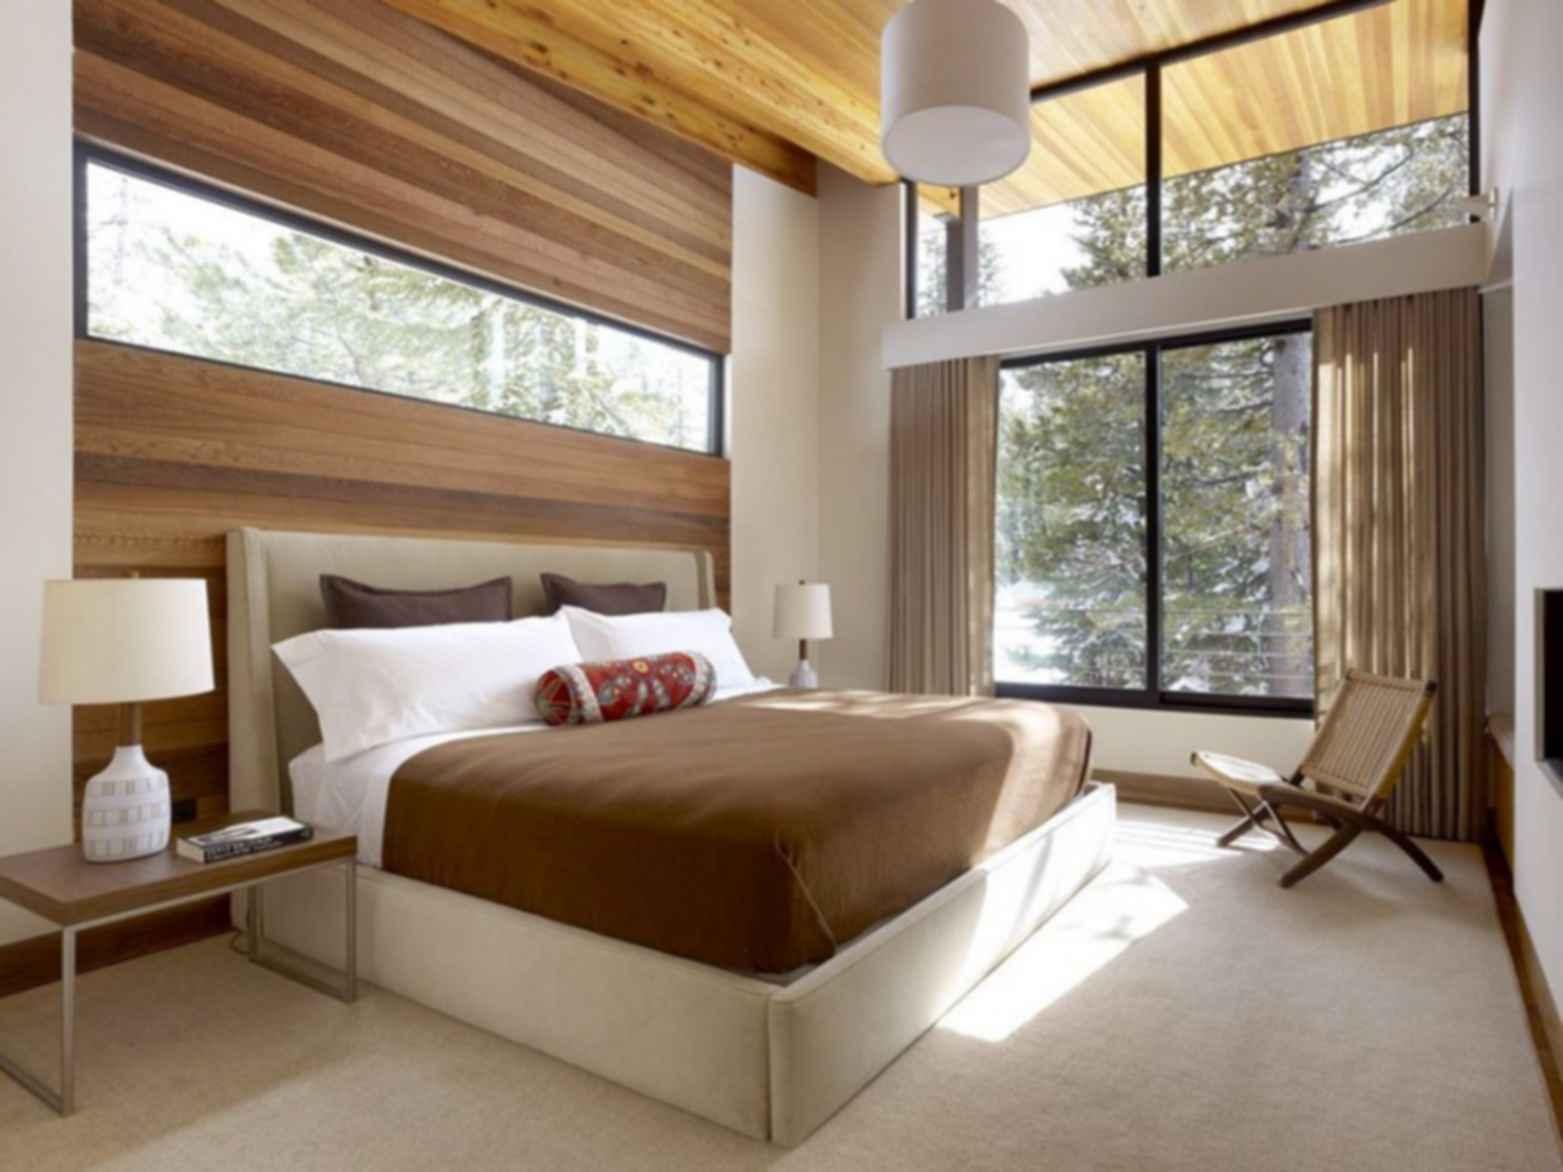 The Sugar Bowl Residence - Interior Bedroom